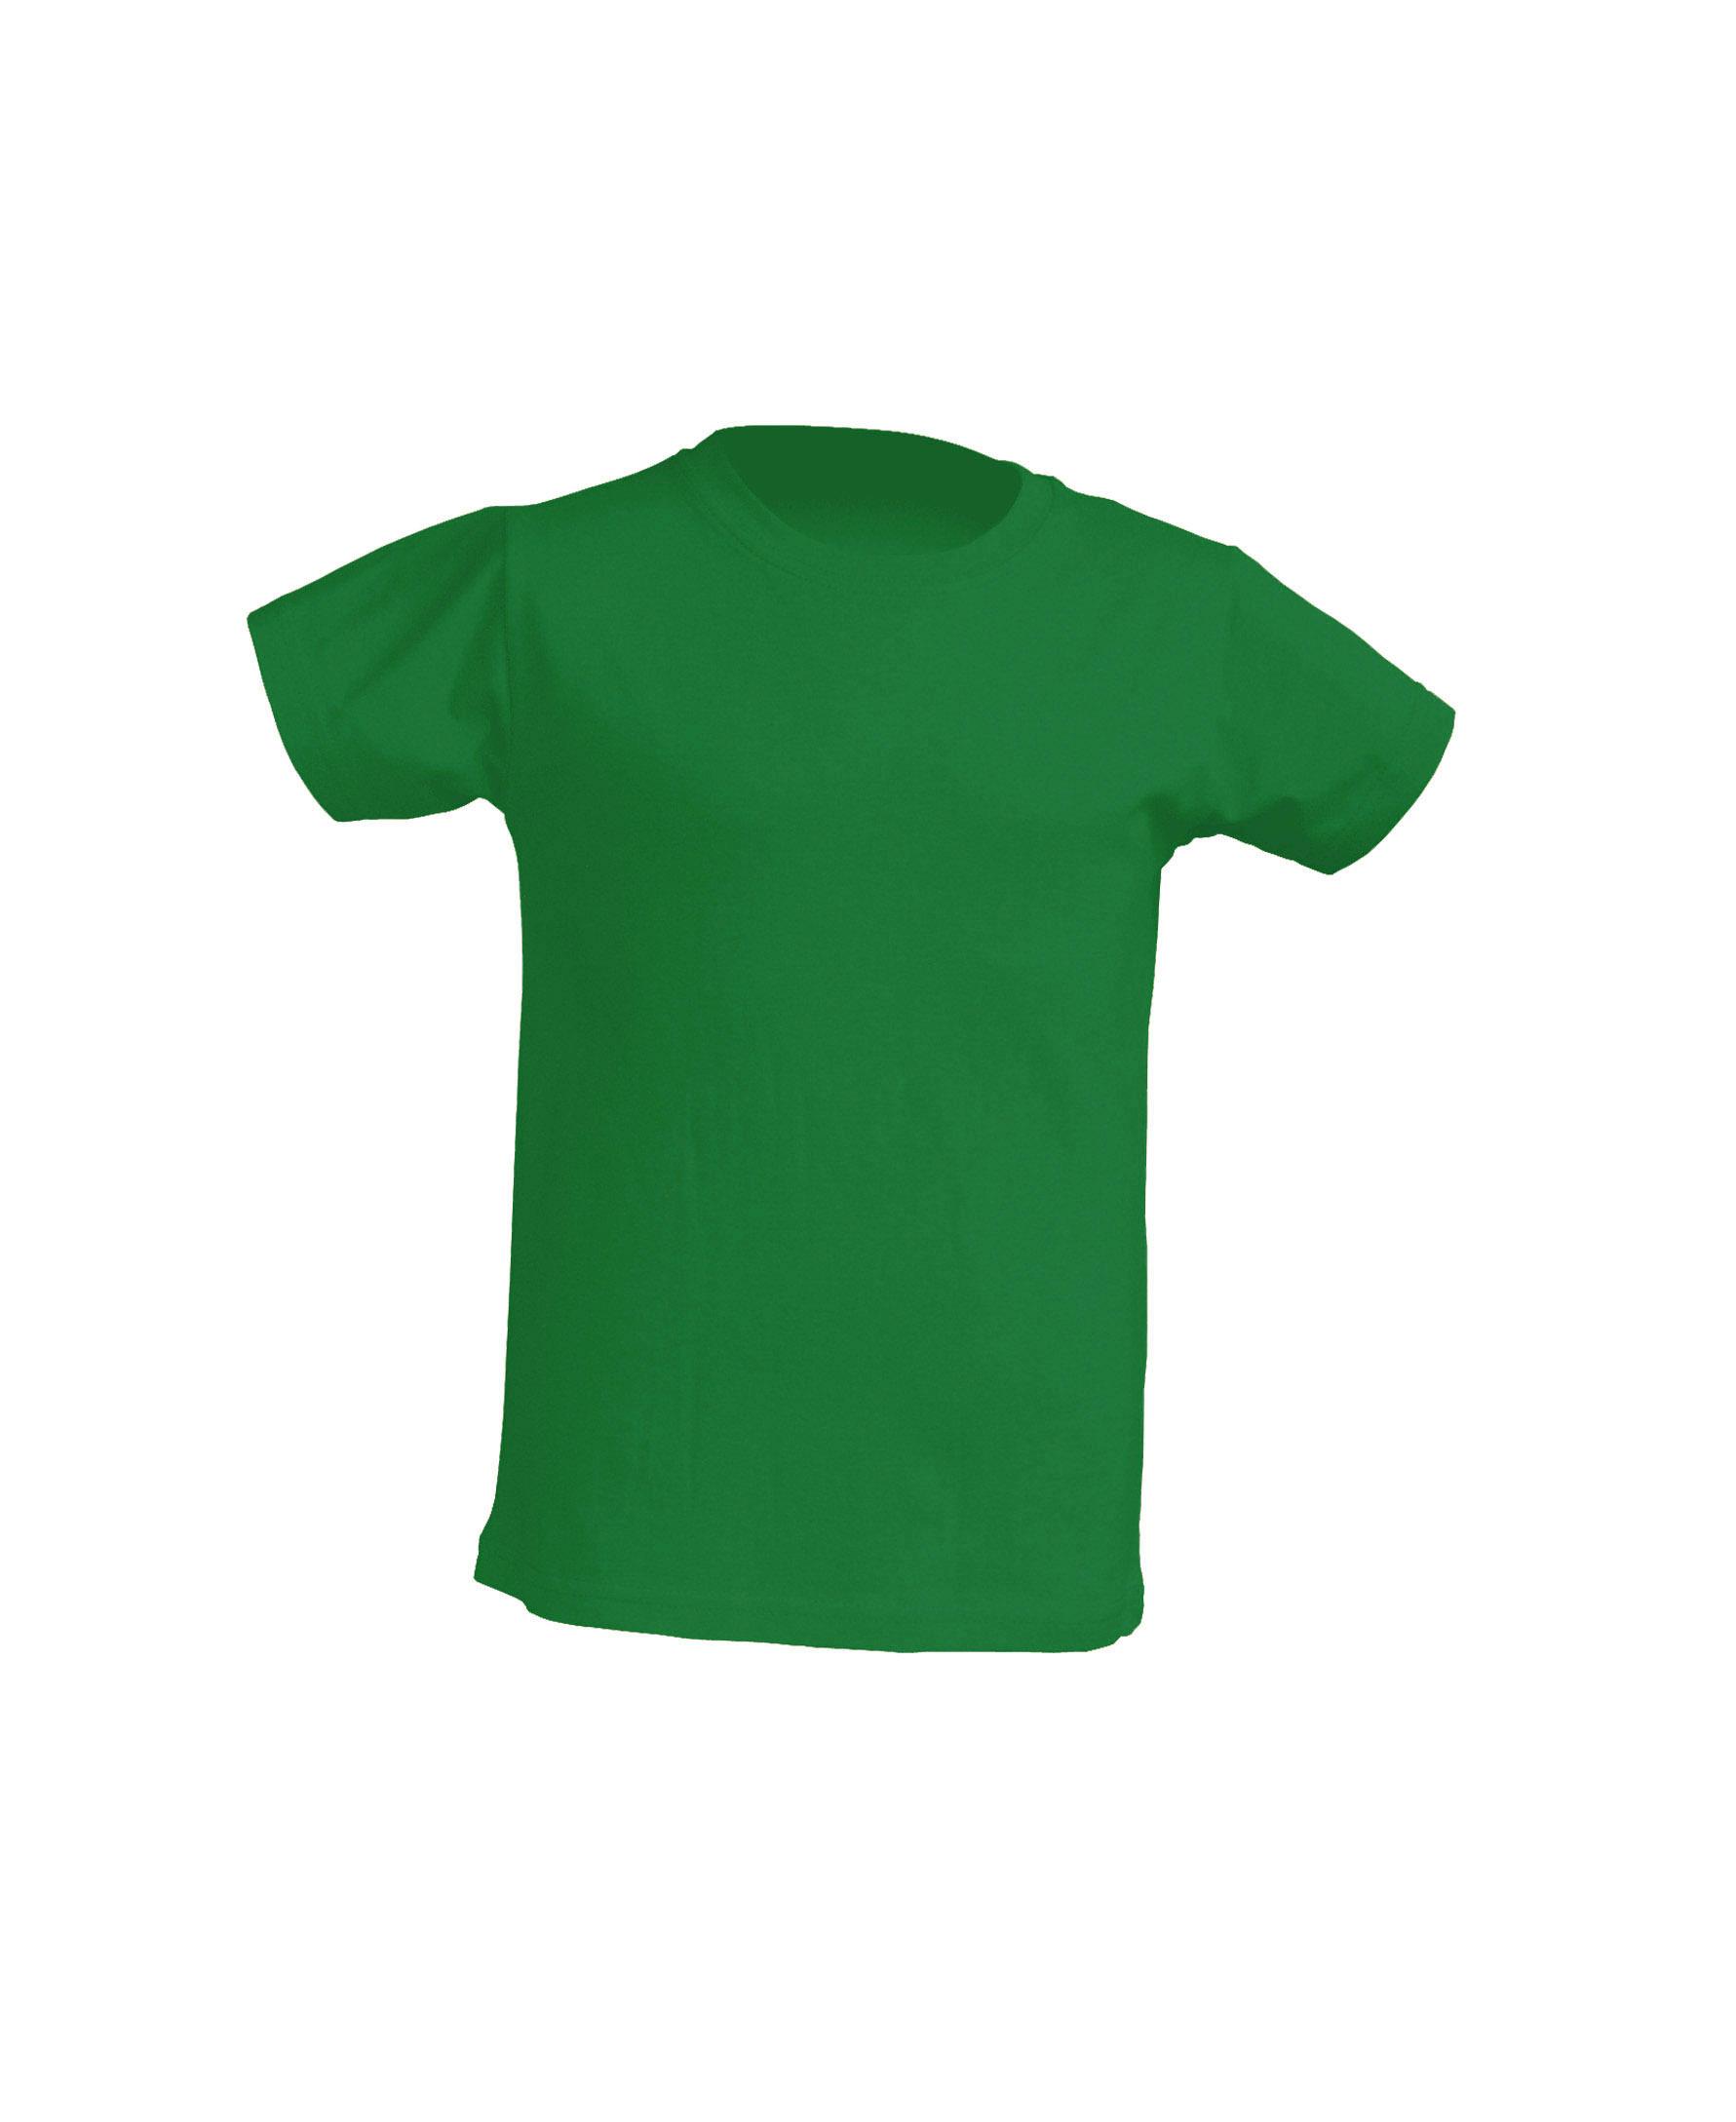 Dječja t-shirt majica kratki rukav kelly green